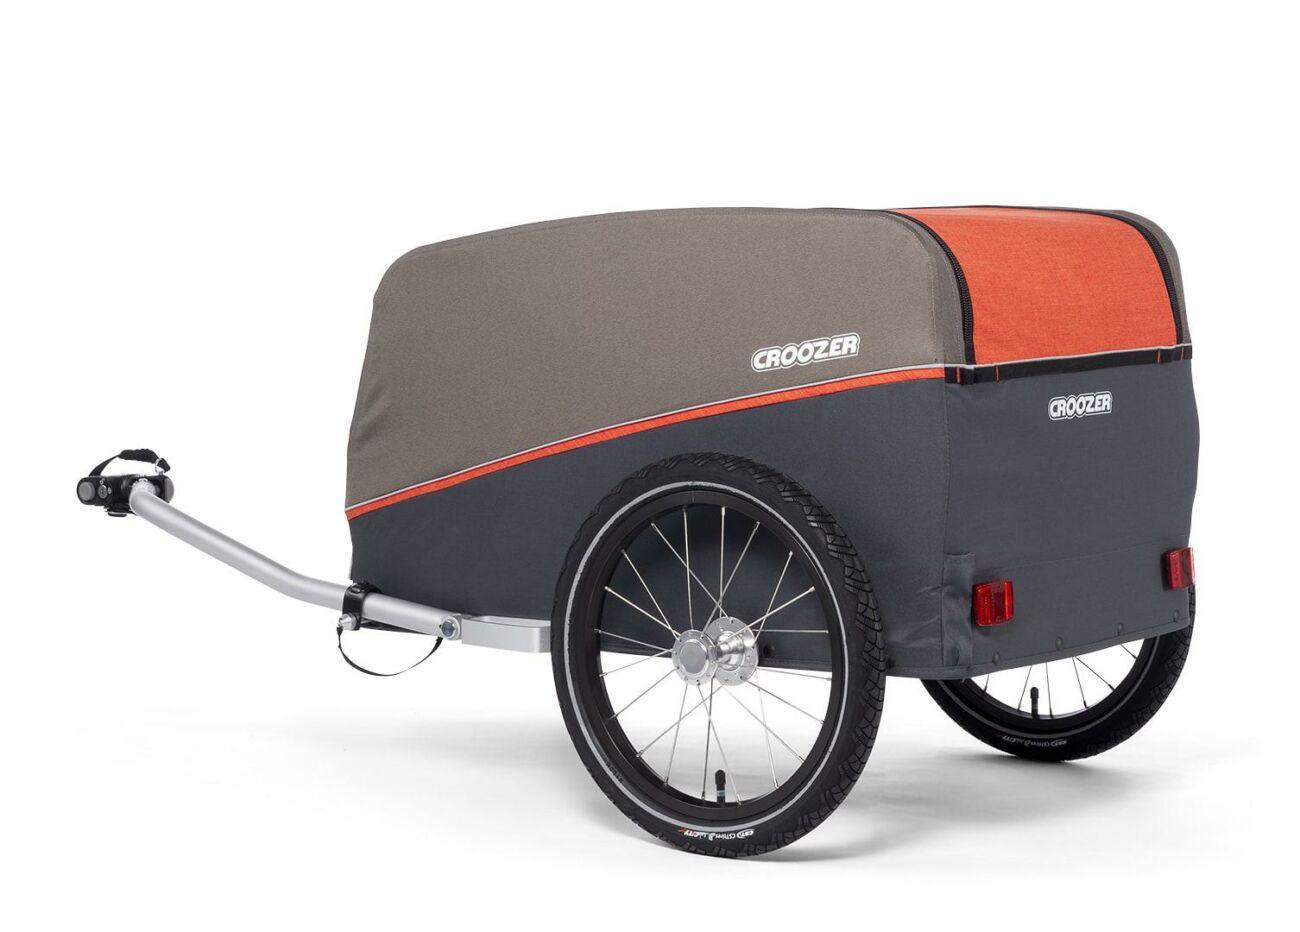 121000518 Croozer Cargo Pakko Seite Campfire Red 2020 Web